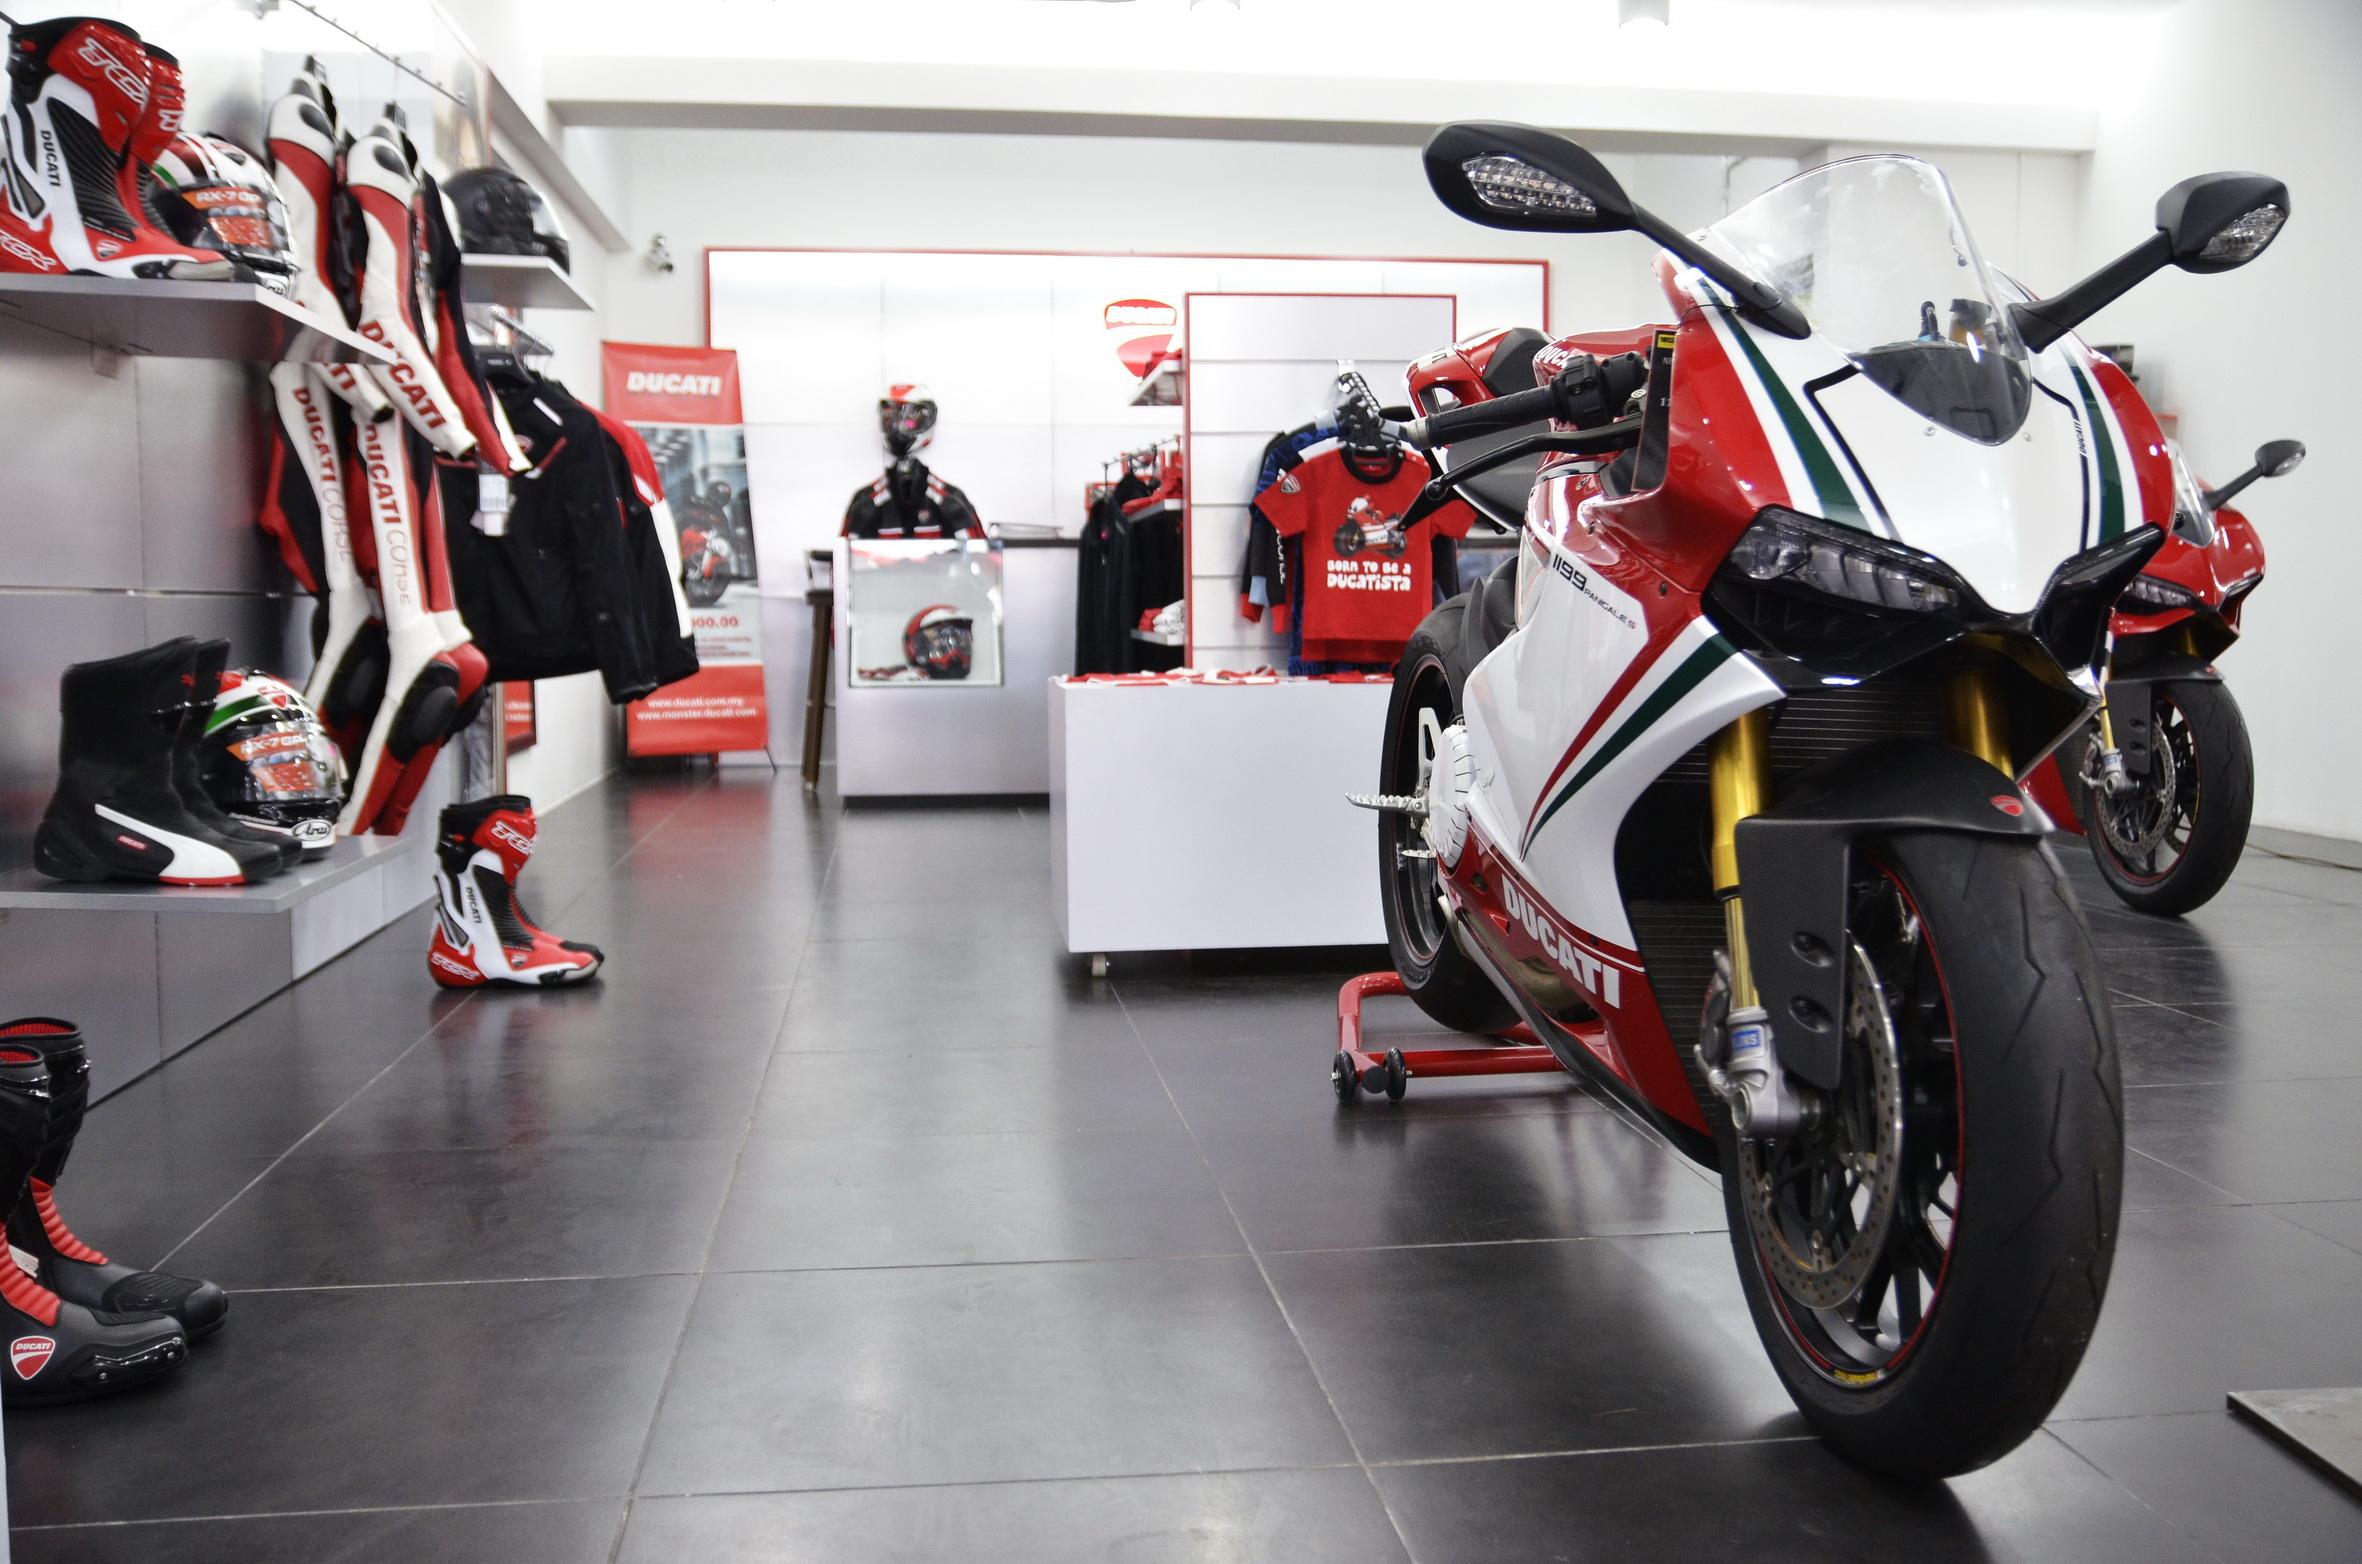 Ducati Malaysia opens first dealership - Bikes Republic